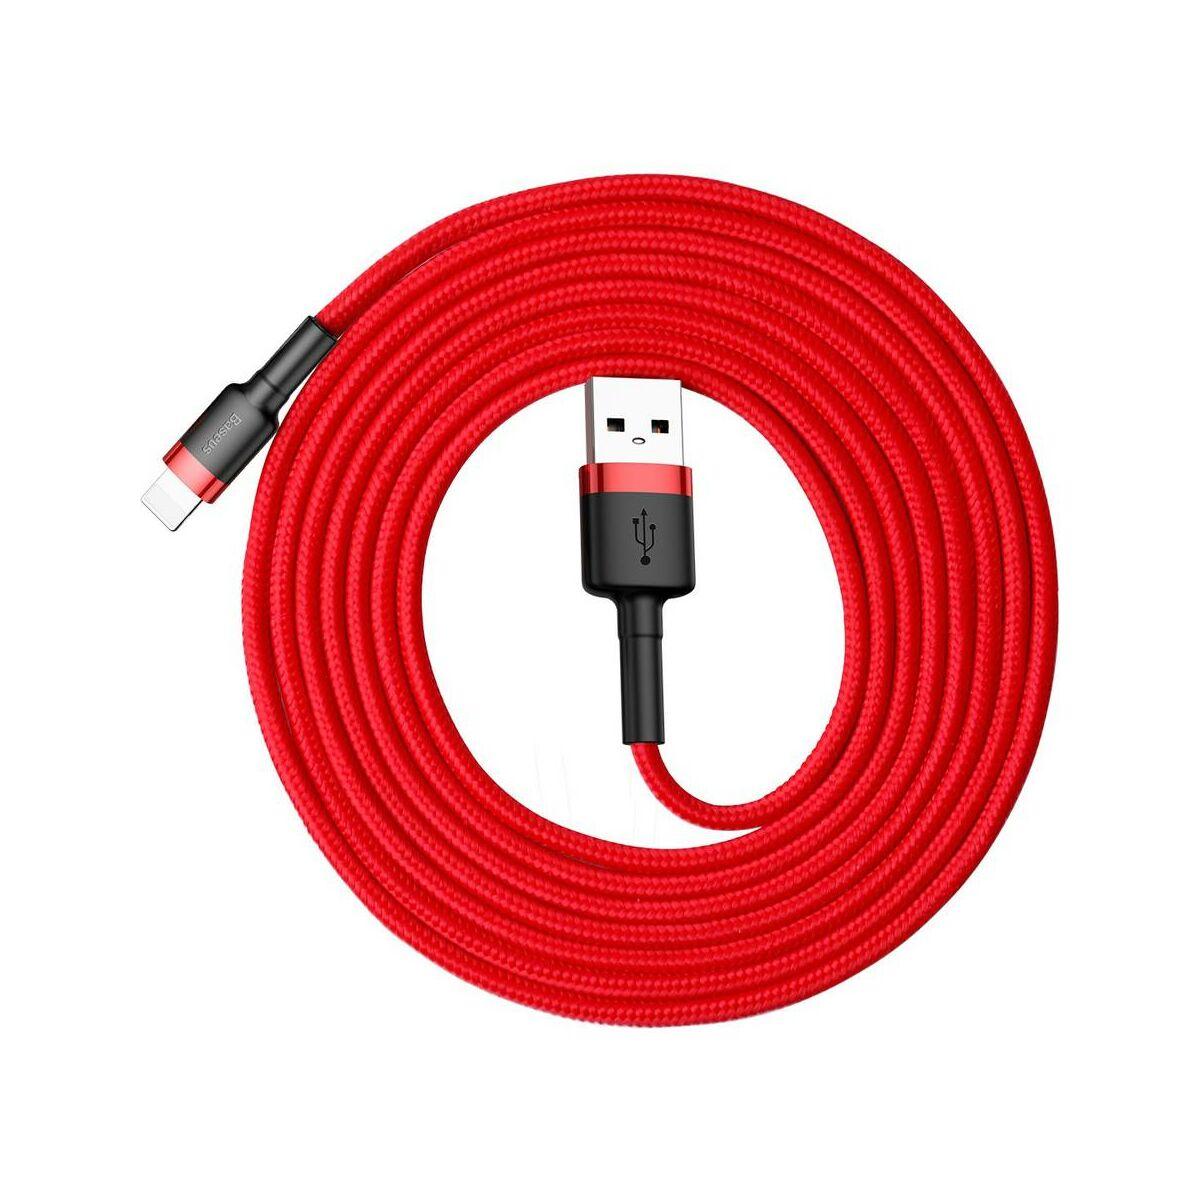 Baseus Lightning kábel, Cafule 1.5A, 2m, piros/piros (CALKLF-C09)